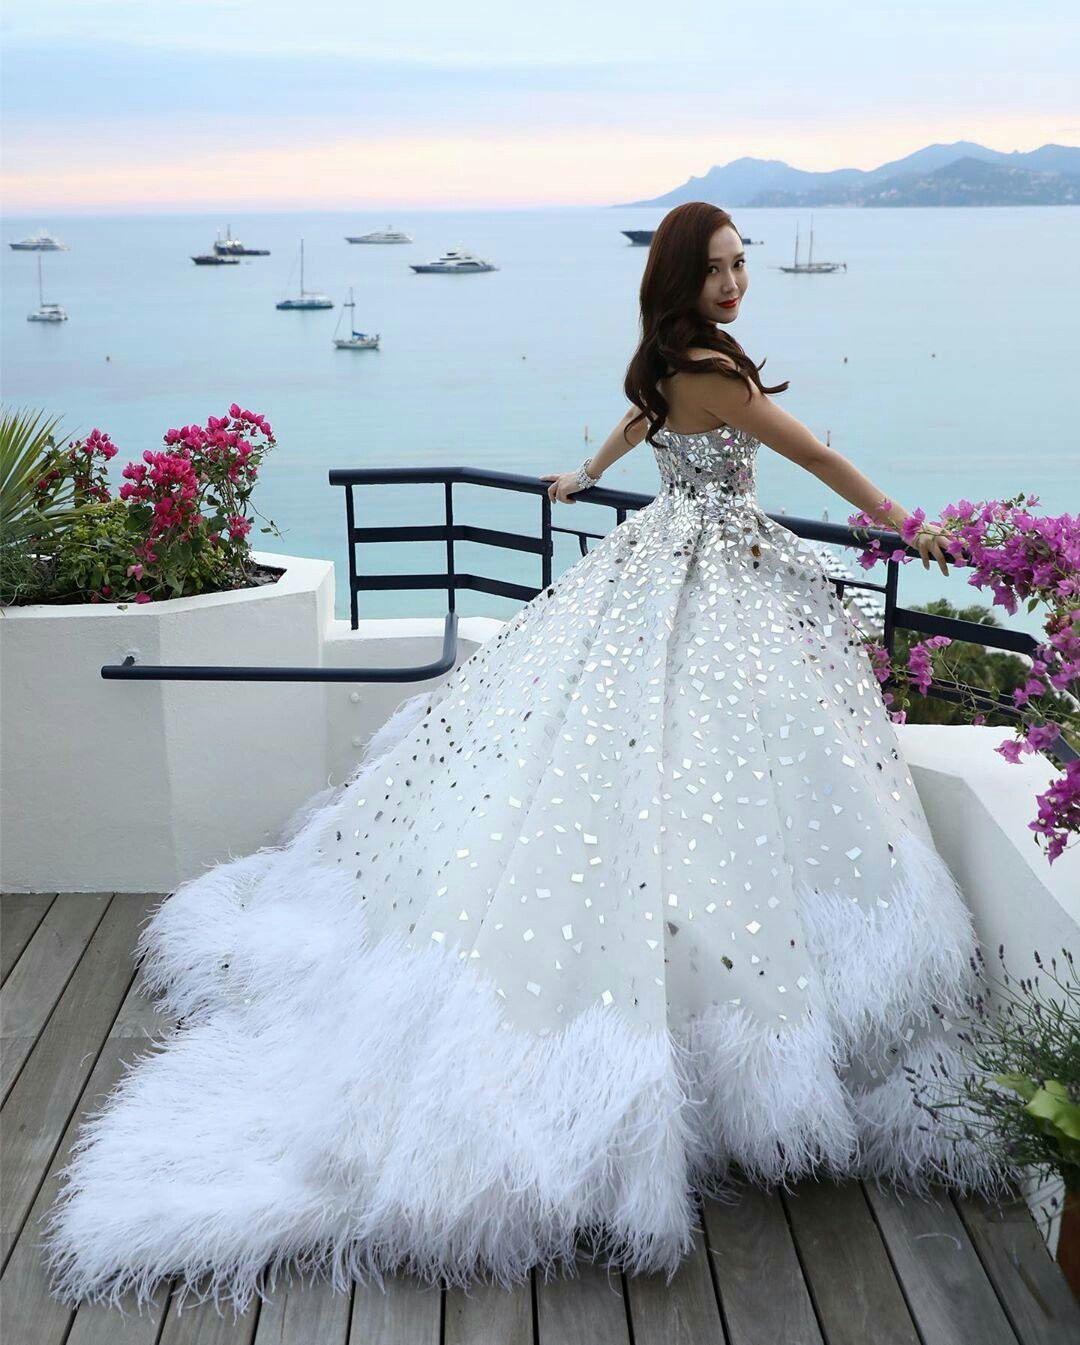 Pin Oleh Mymiris M Di Jessica Jung Gaun Kecantikan Putih